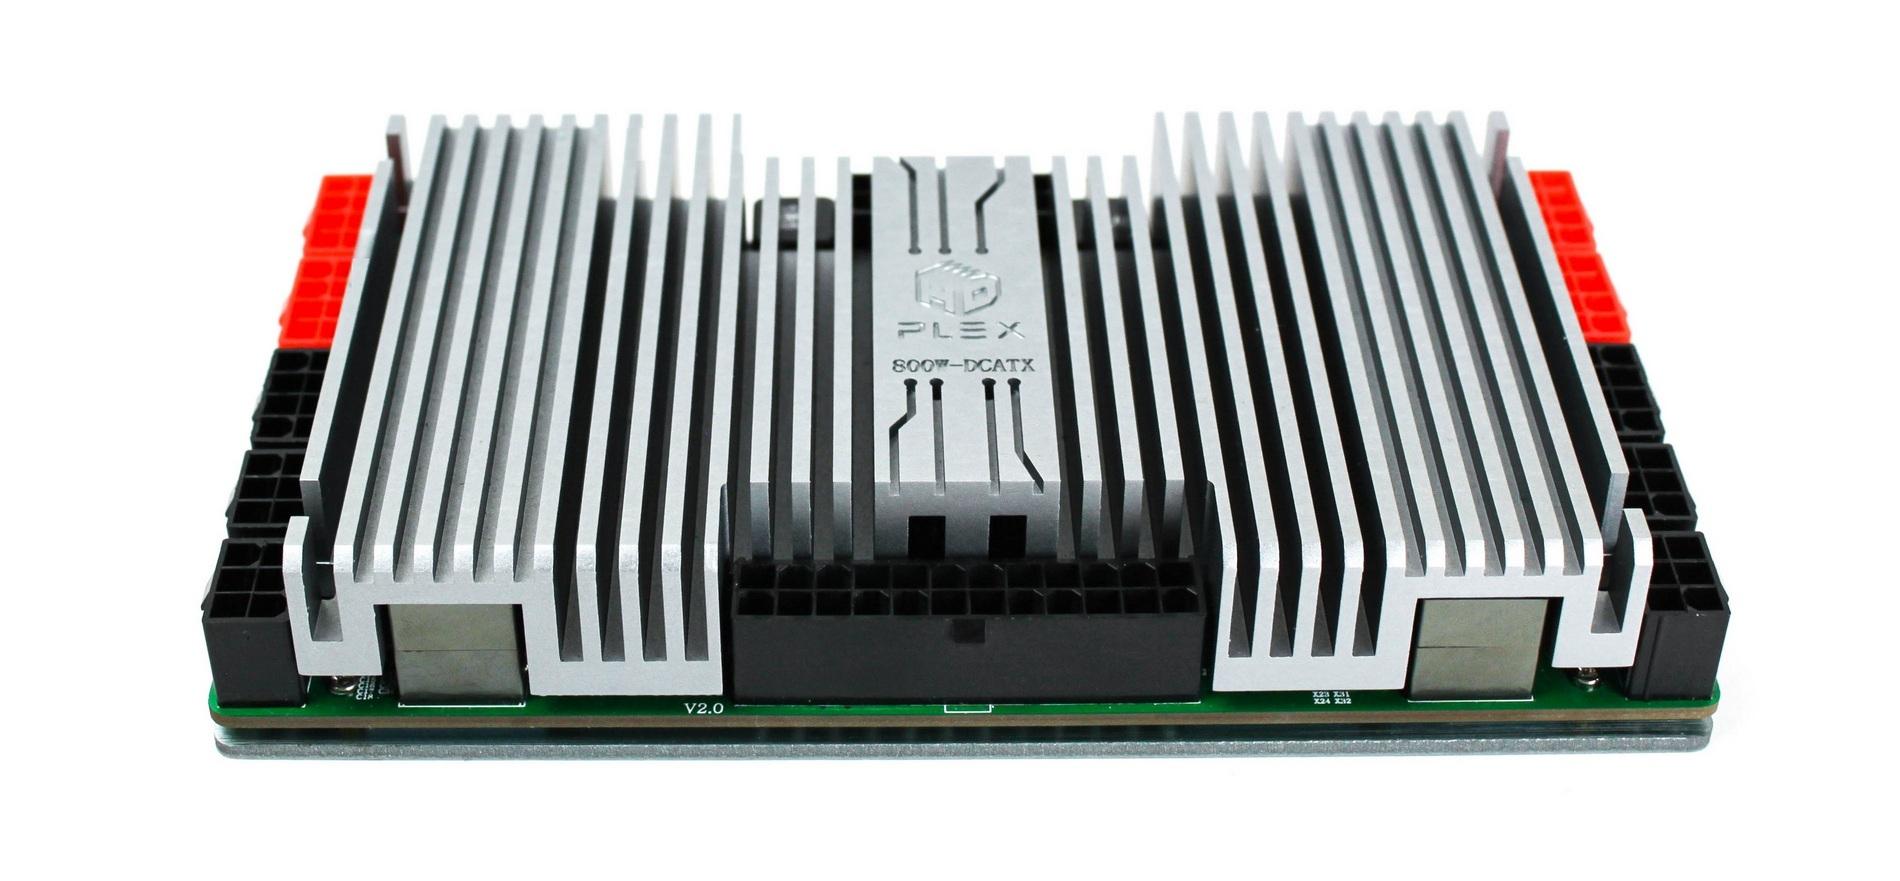 HDPLEX 800W DC-ATX Converter